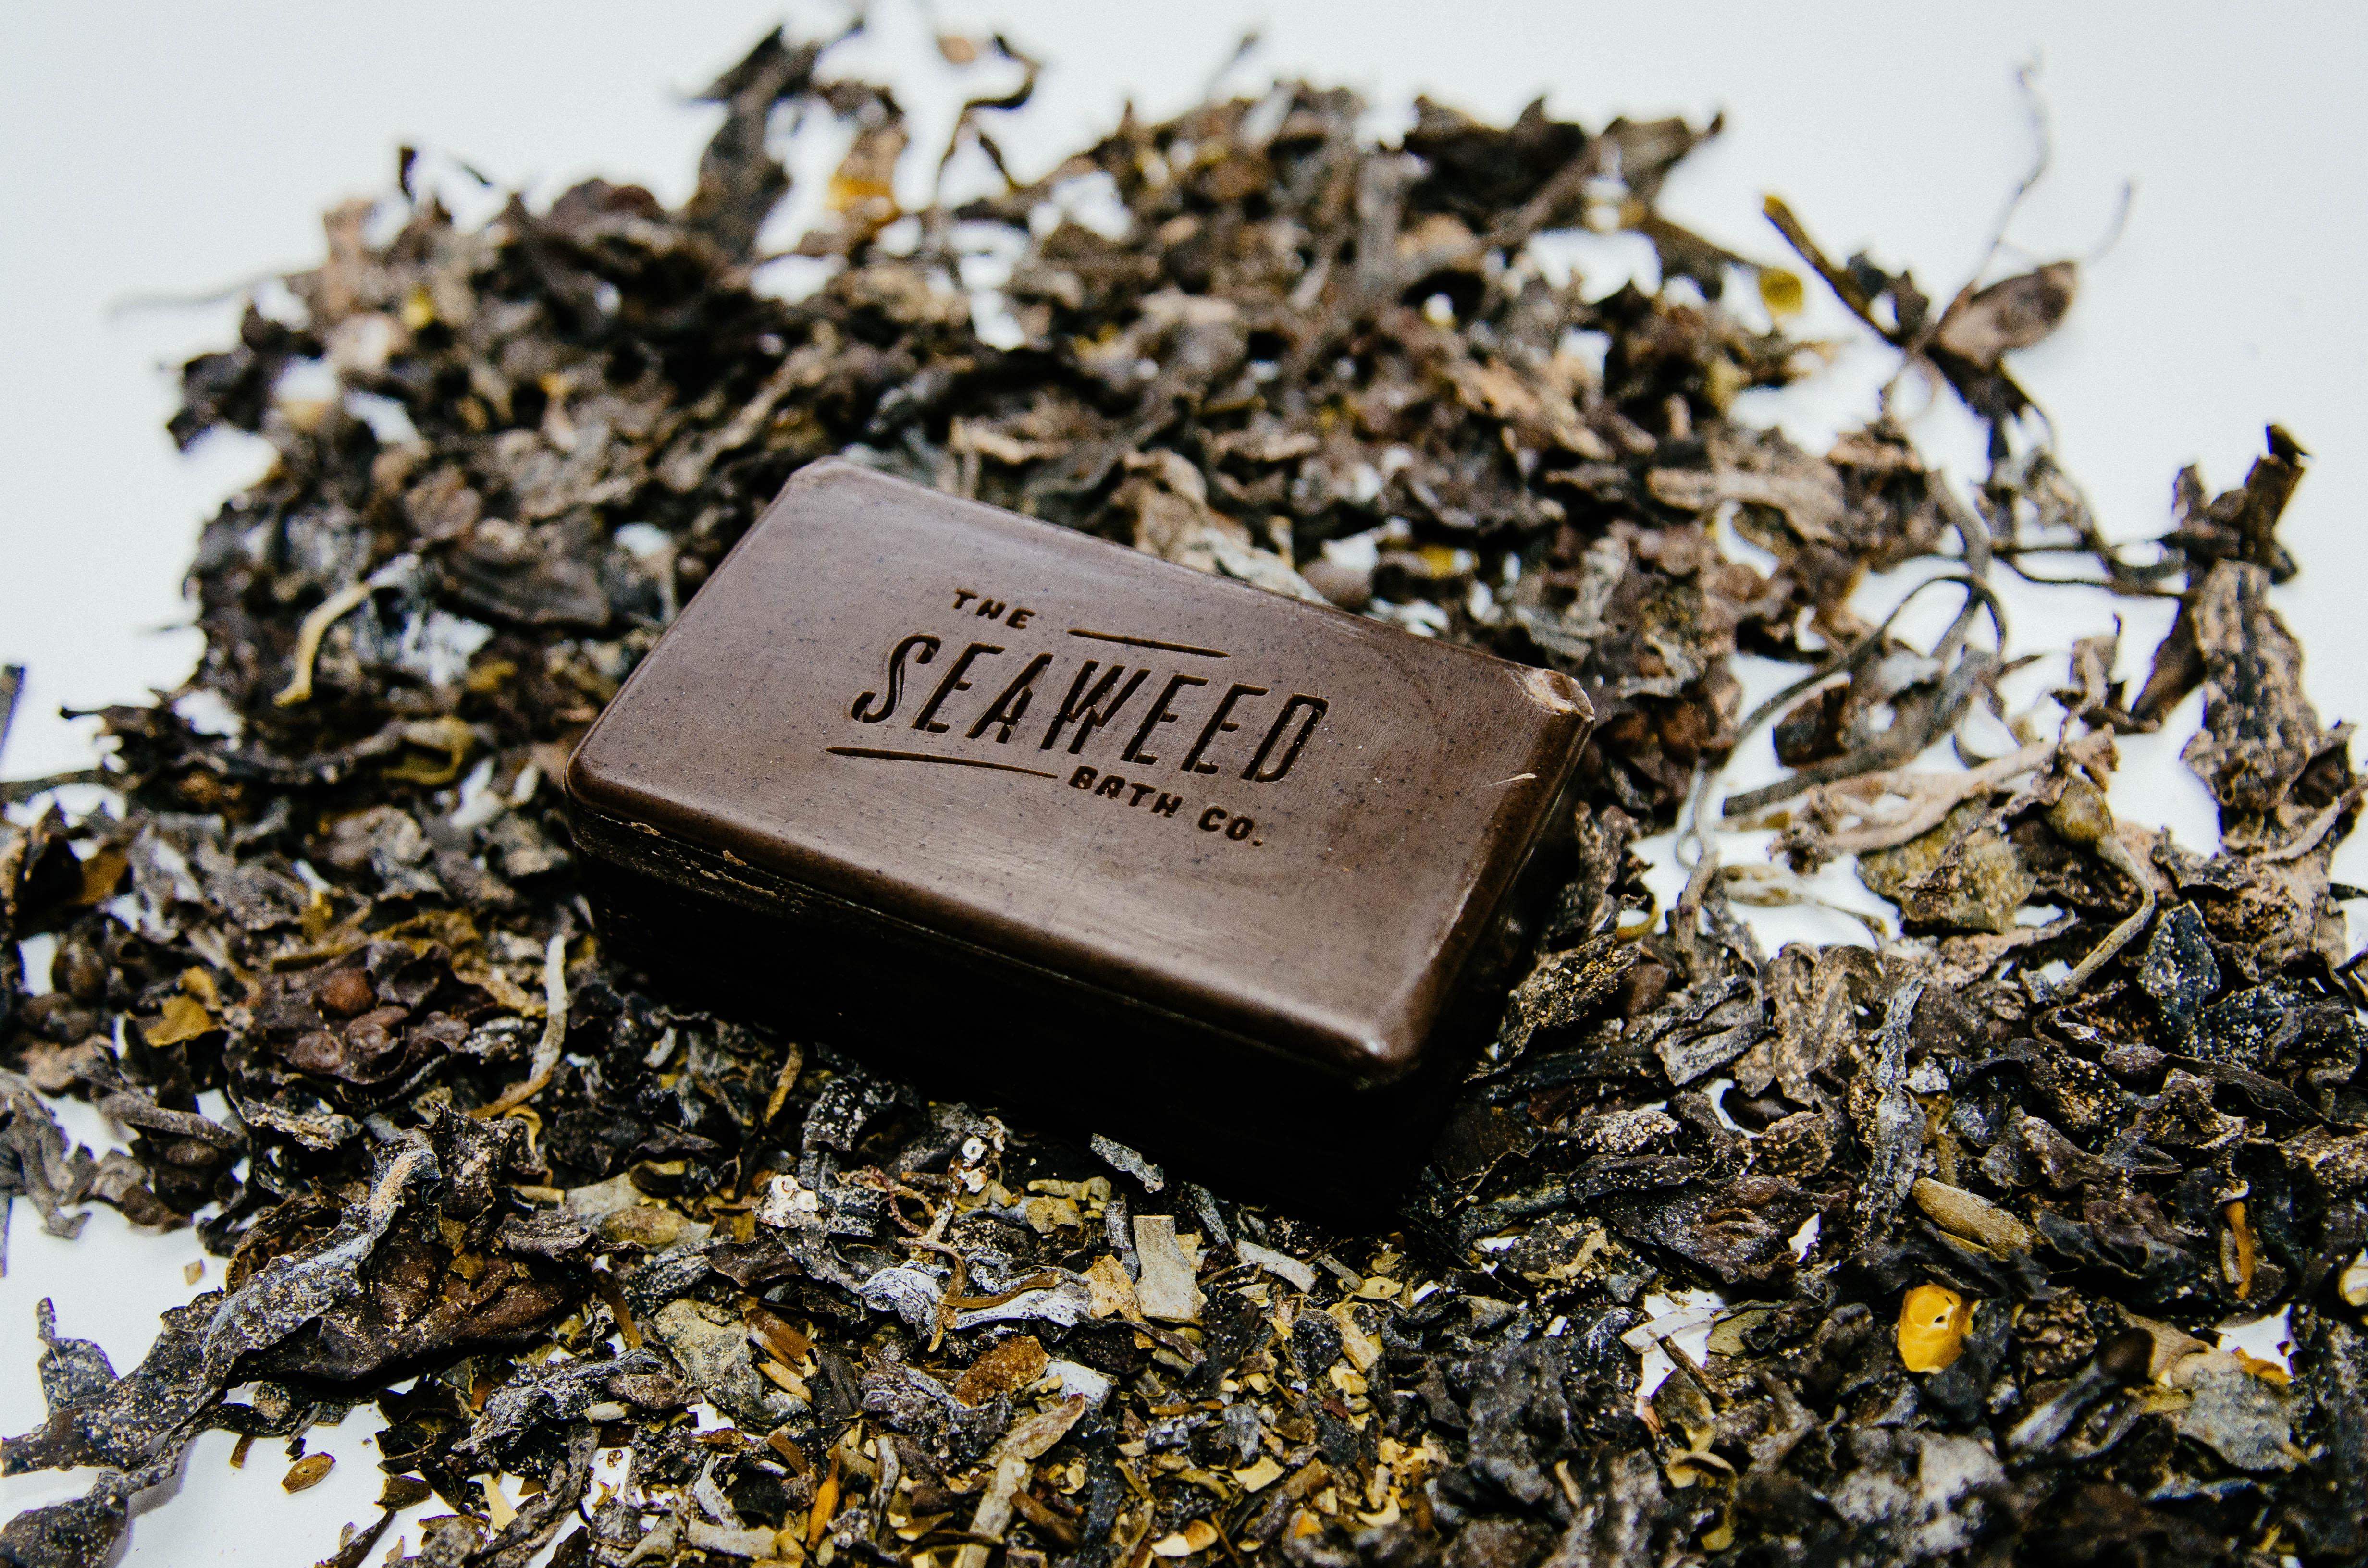 The Seaweed Bath Co. Soap